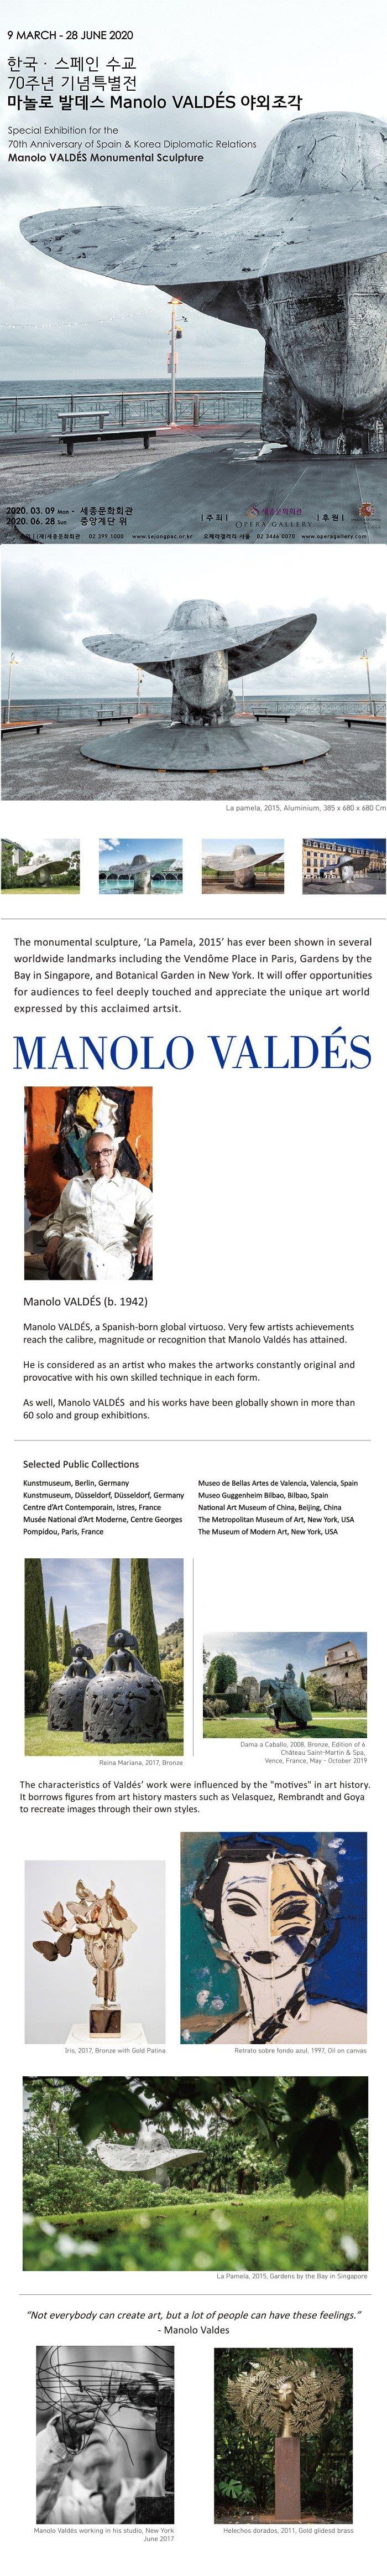 Manolo VALDES Monumental Sculpture